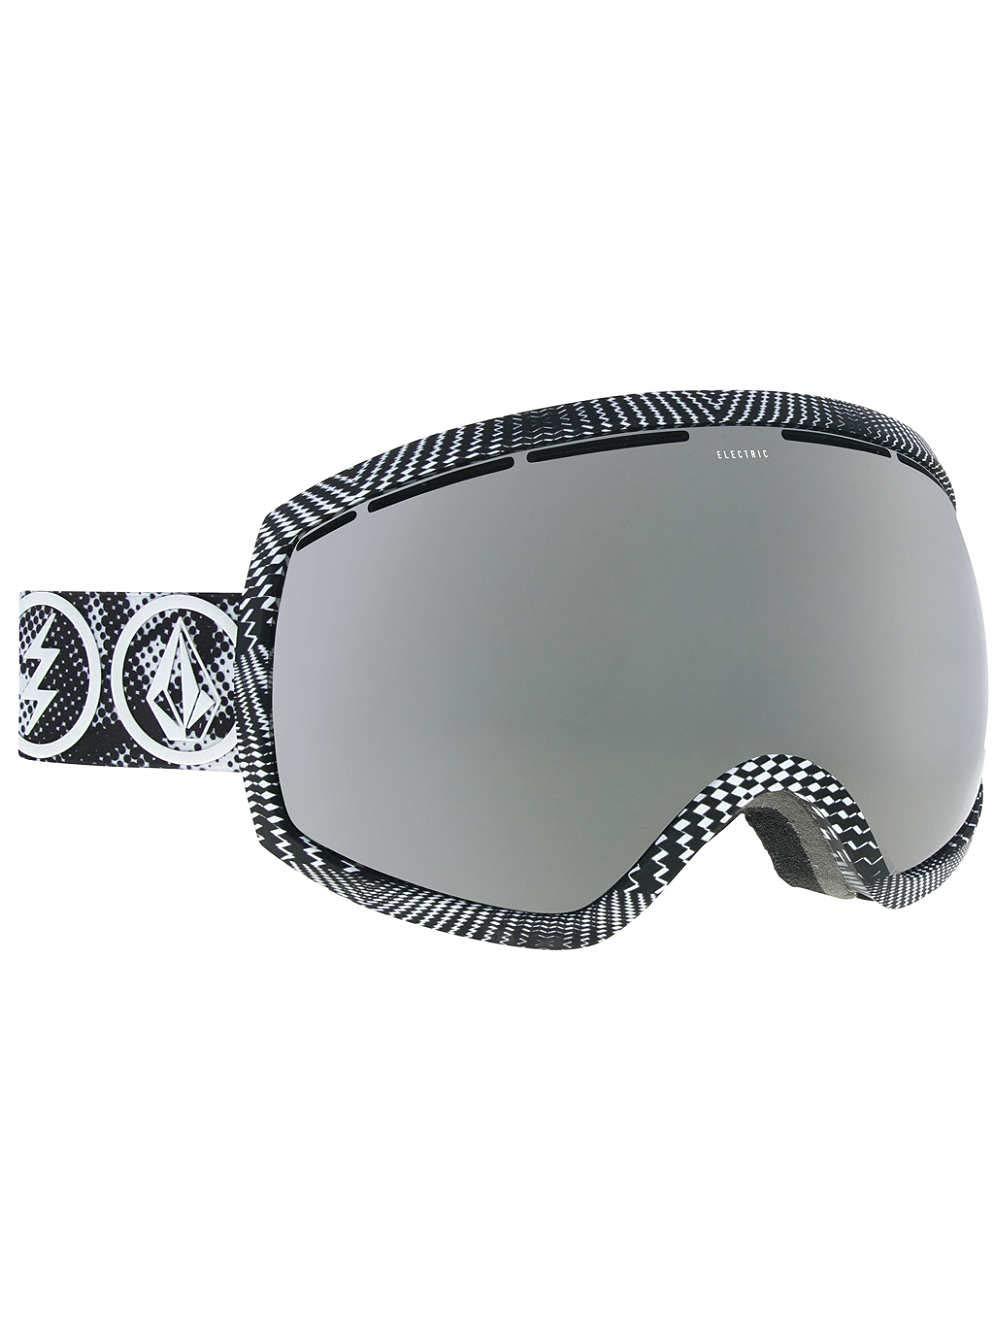 Electric California - EG2 - Masque - Ski & Snowboard - Mixte - Brose argent Chrome